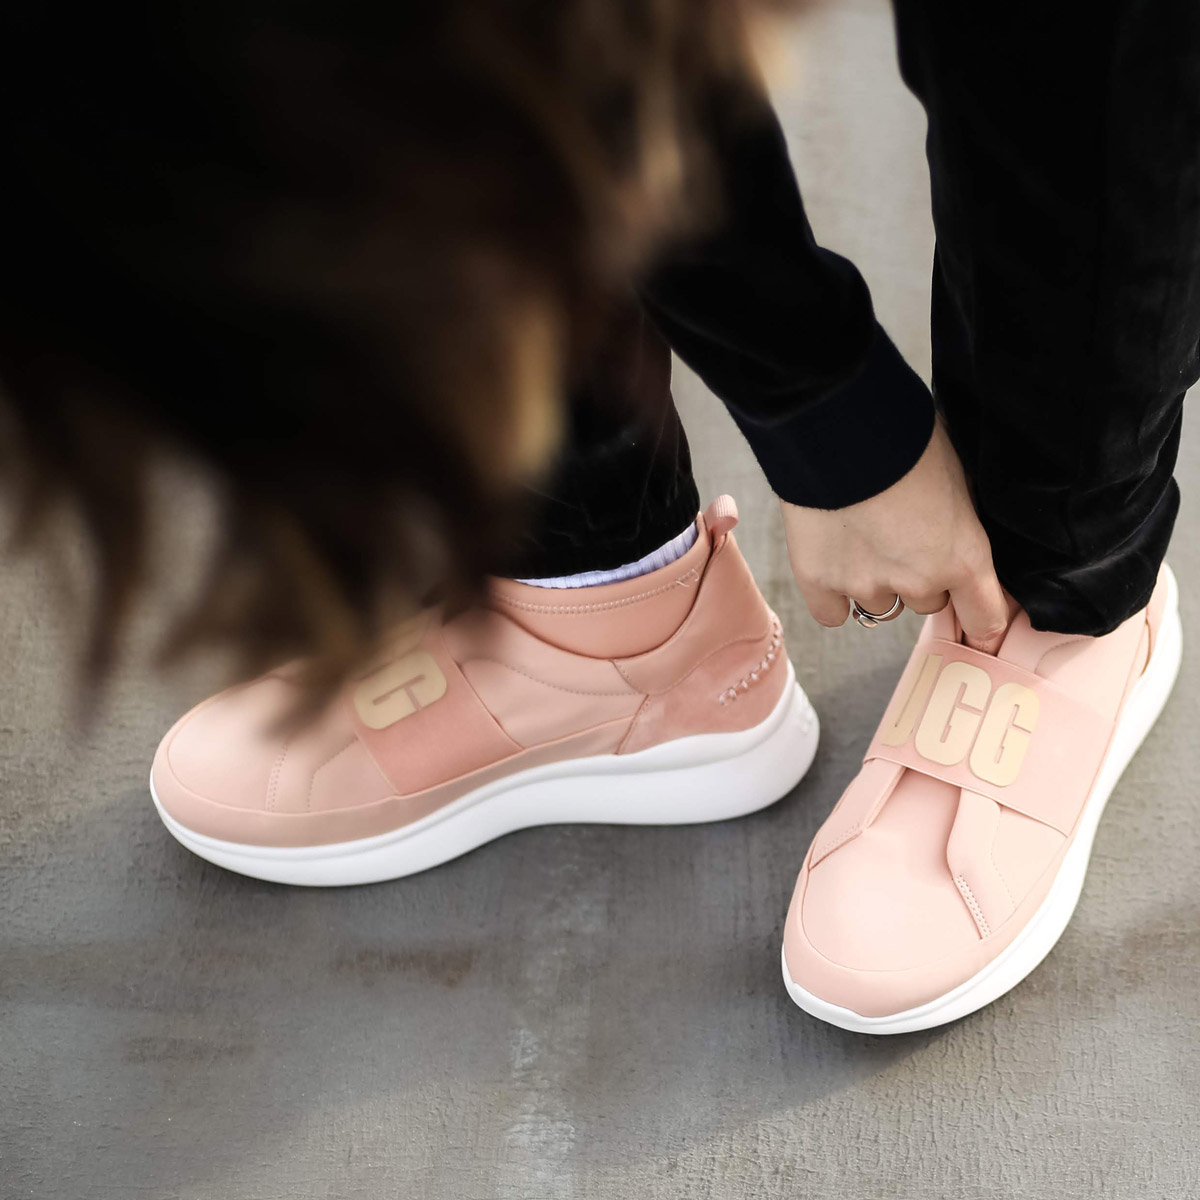 UGG Neutra Sneaker (アグ ニュートラ スニーカー)SUNTAN【レディース スニーカー】18FW-I